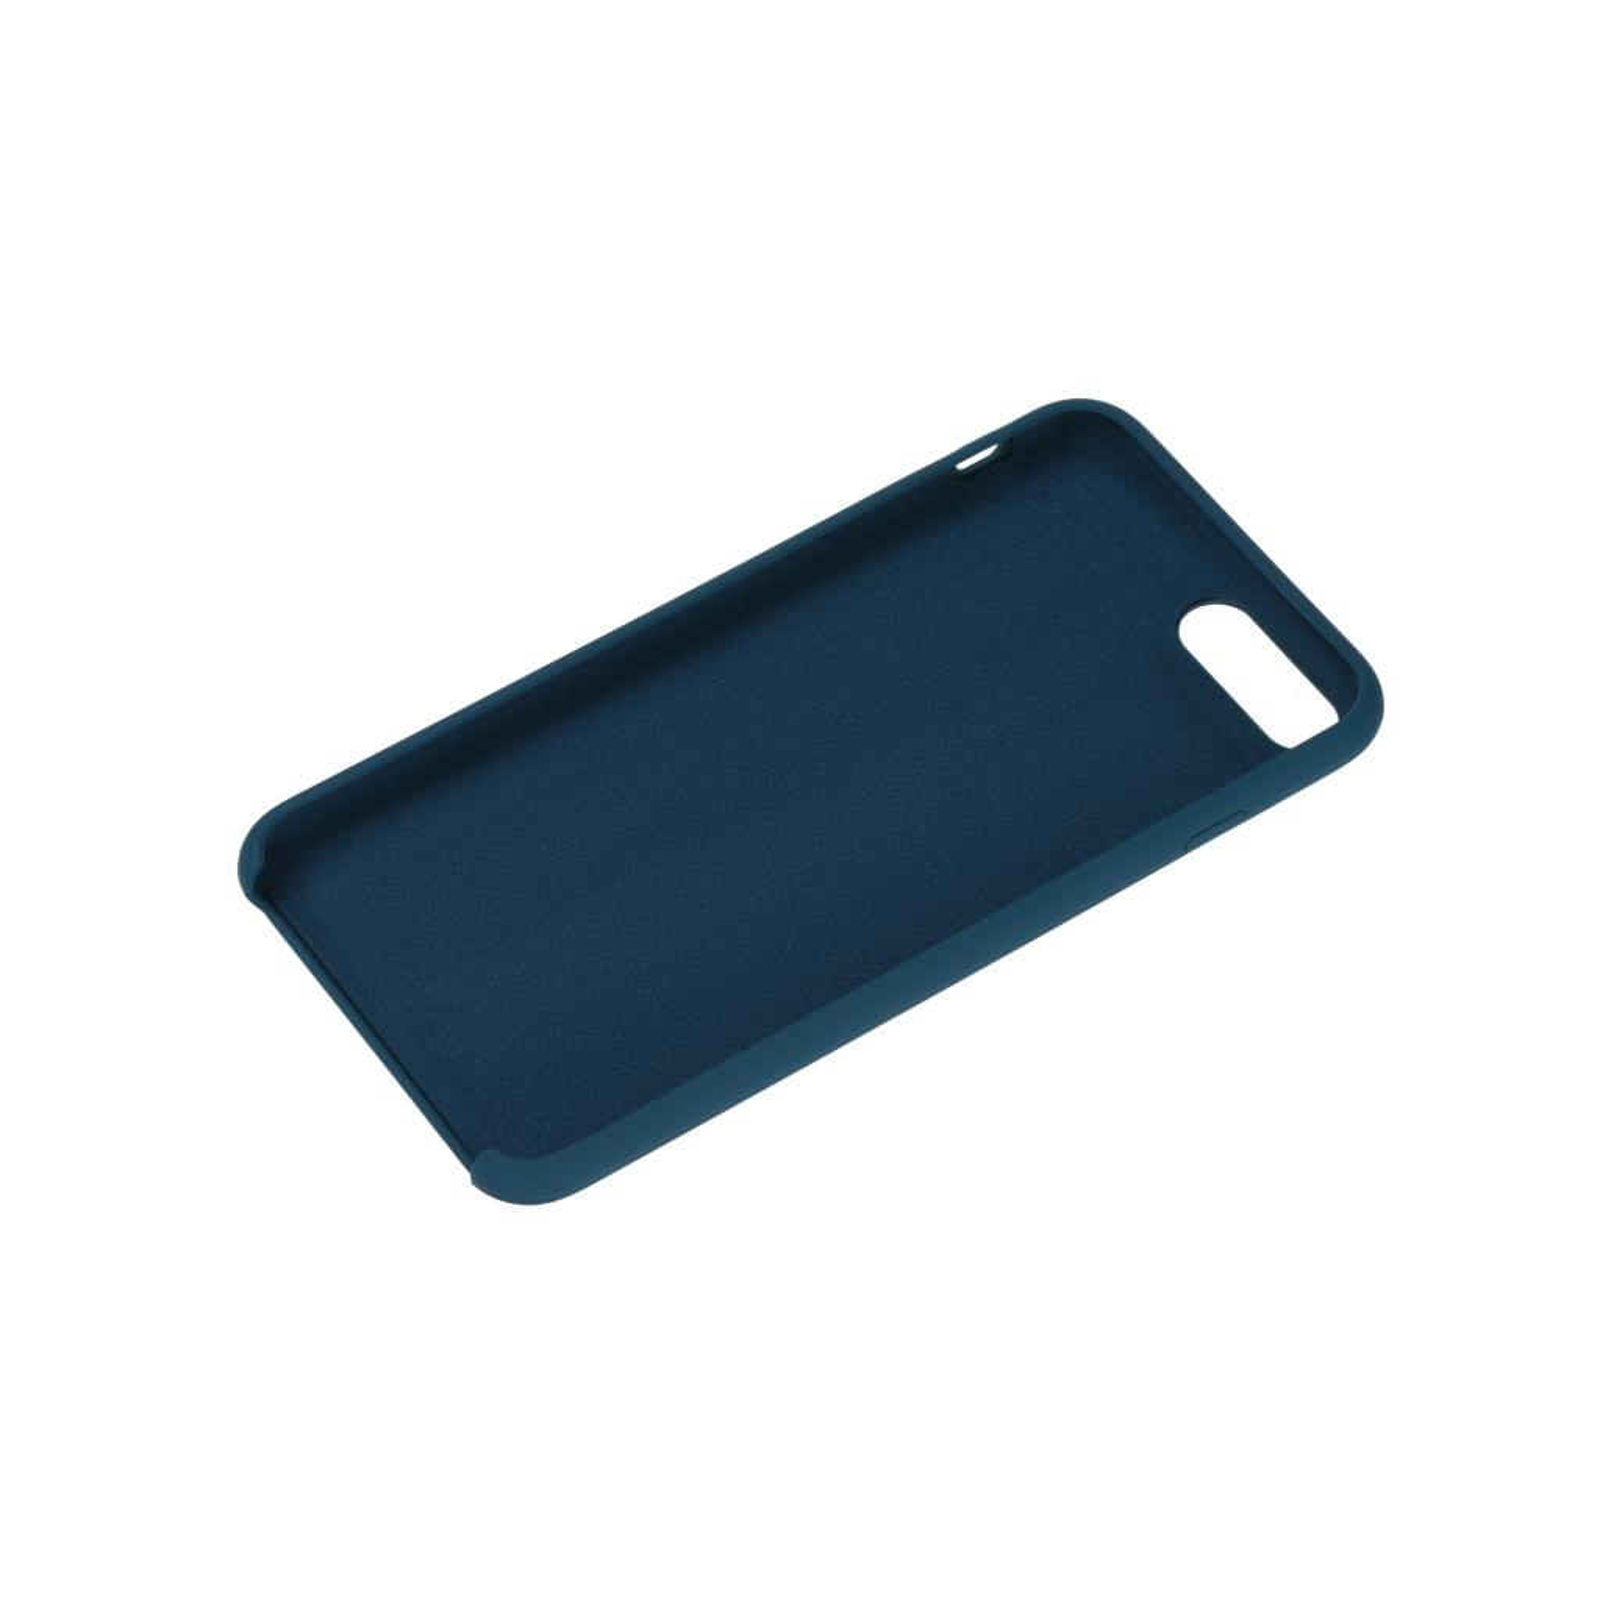 Чохол до моб. телефона 2E Apple iPhone 7/8 Plus, Liquid Silicone, Light Purple (2E-IPH-7/8P-NKSLS-LP) зображення 2